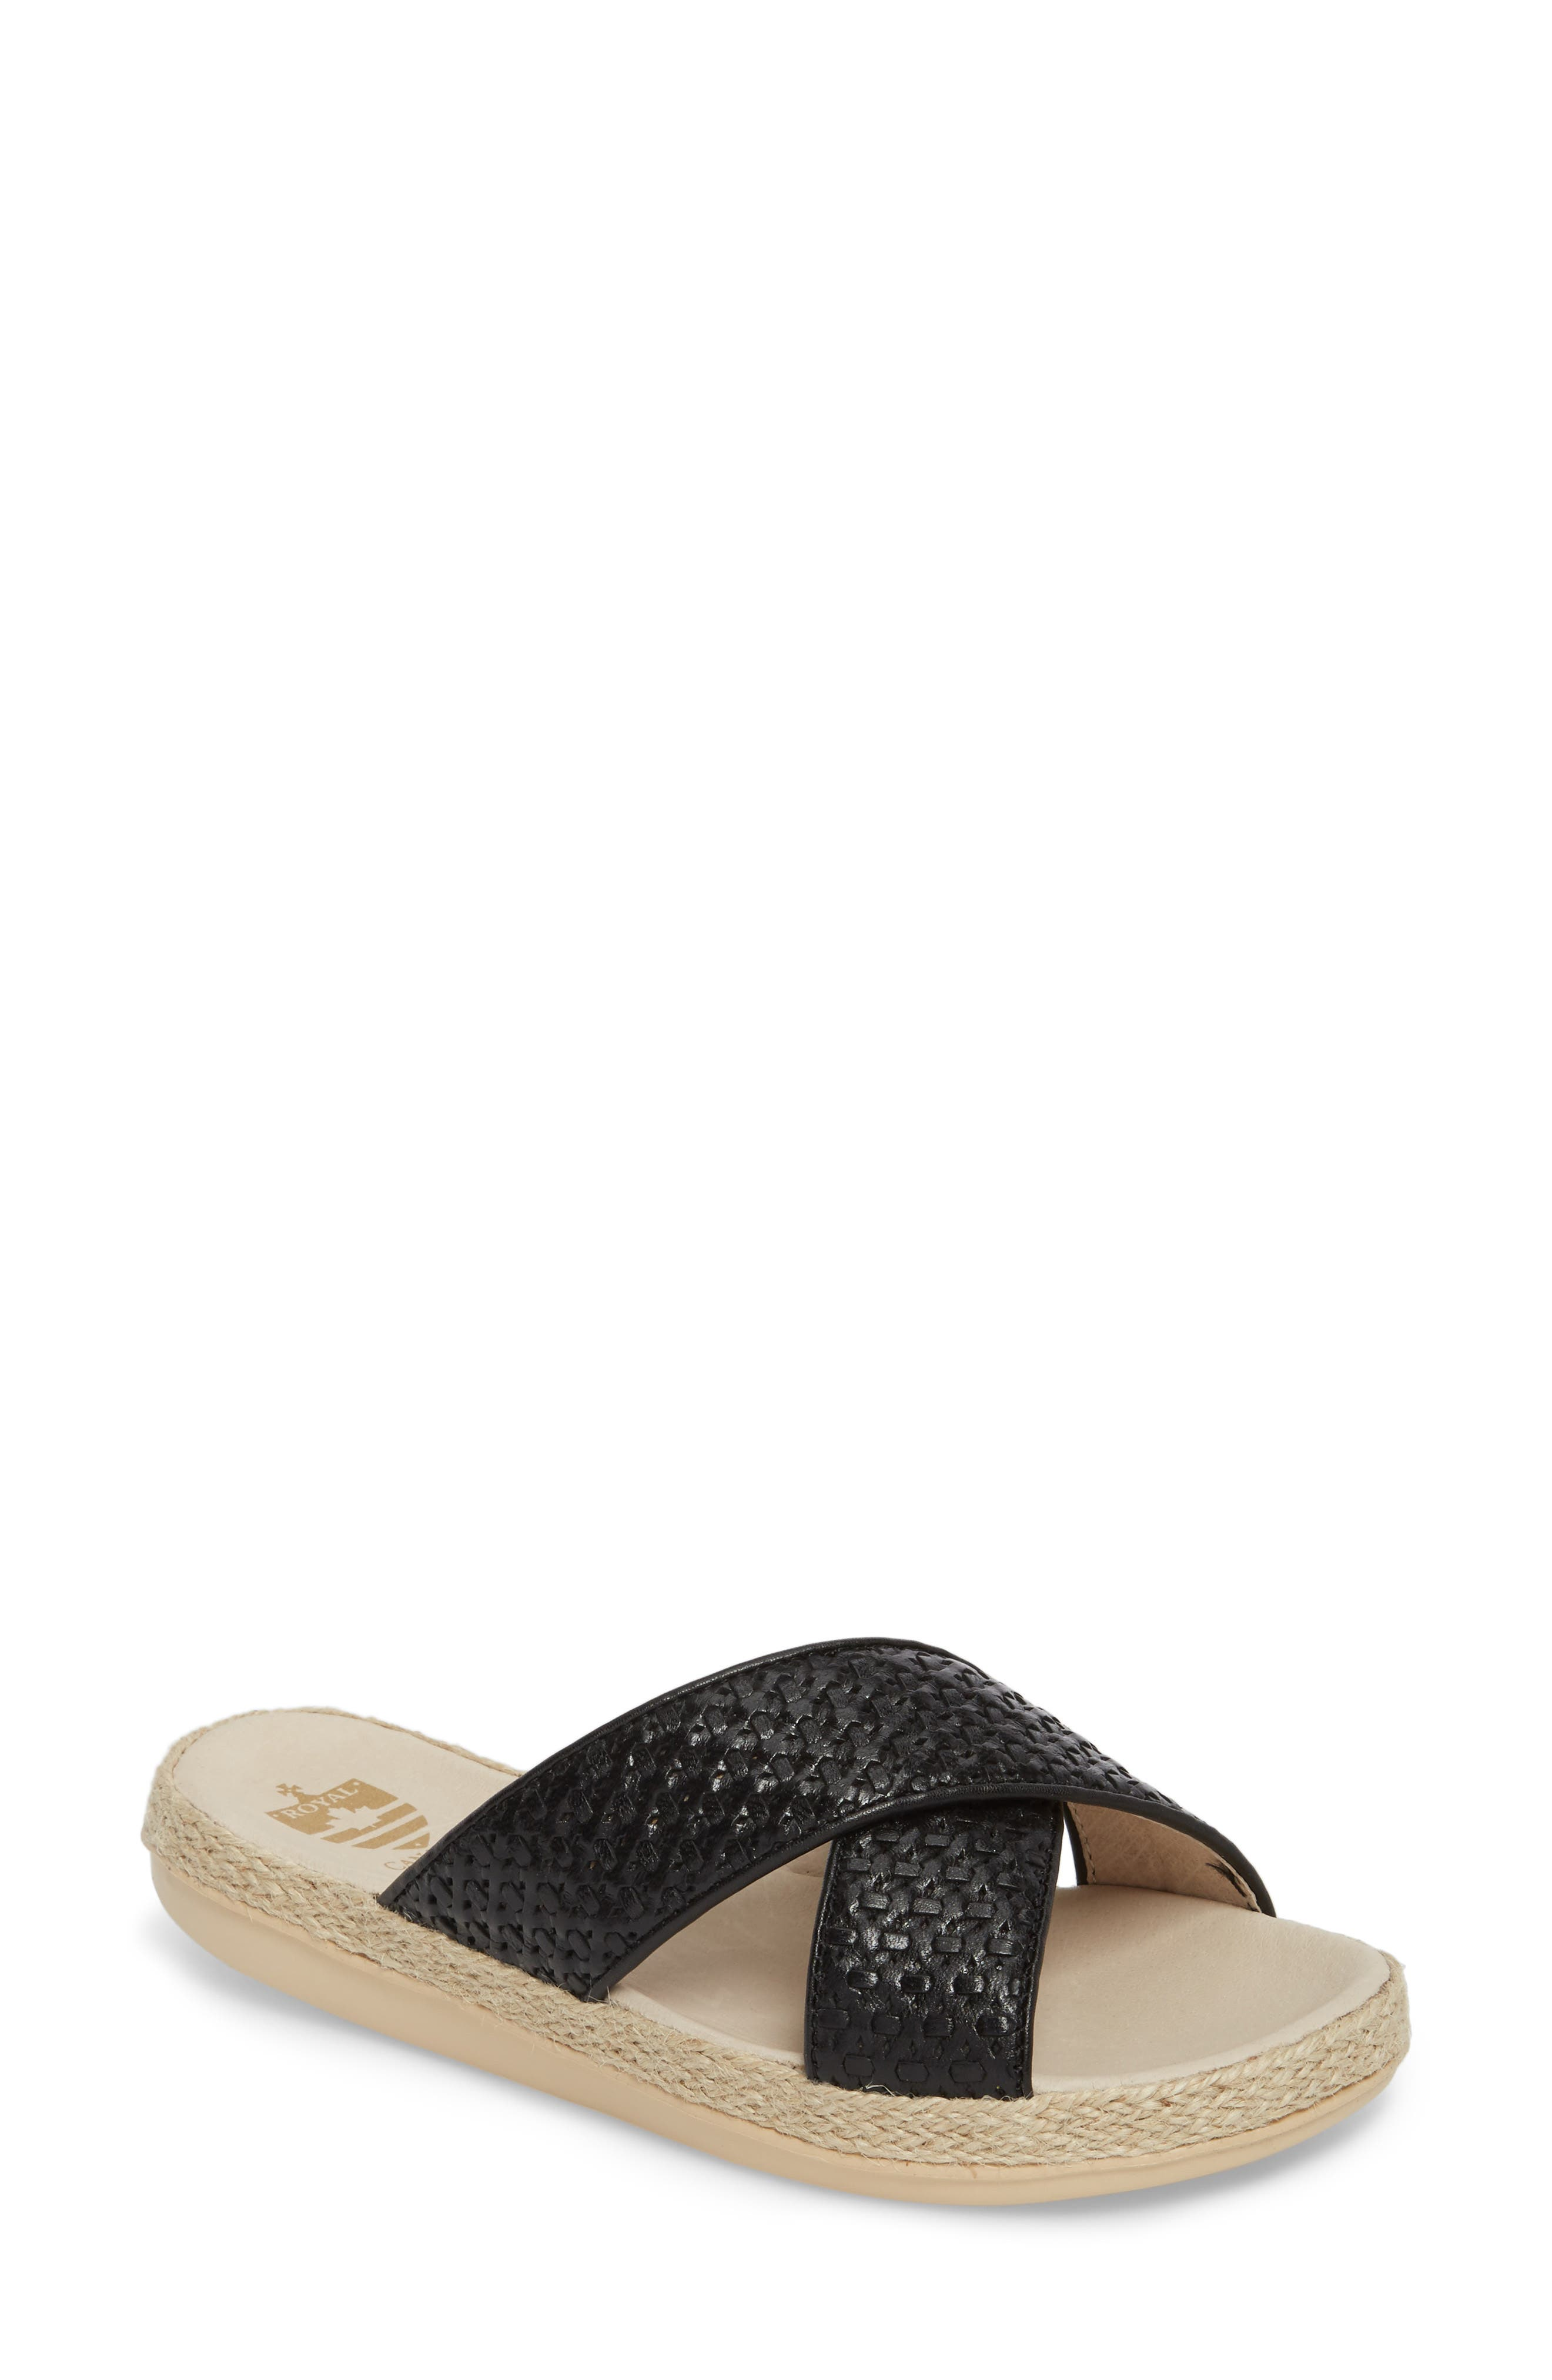 Glencairn Sandal,                         Main,                         color, BLACK LEATHER